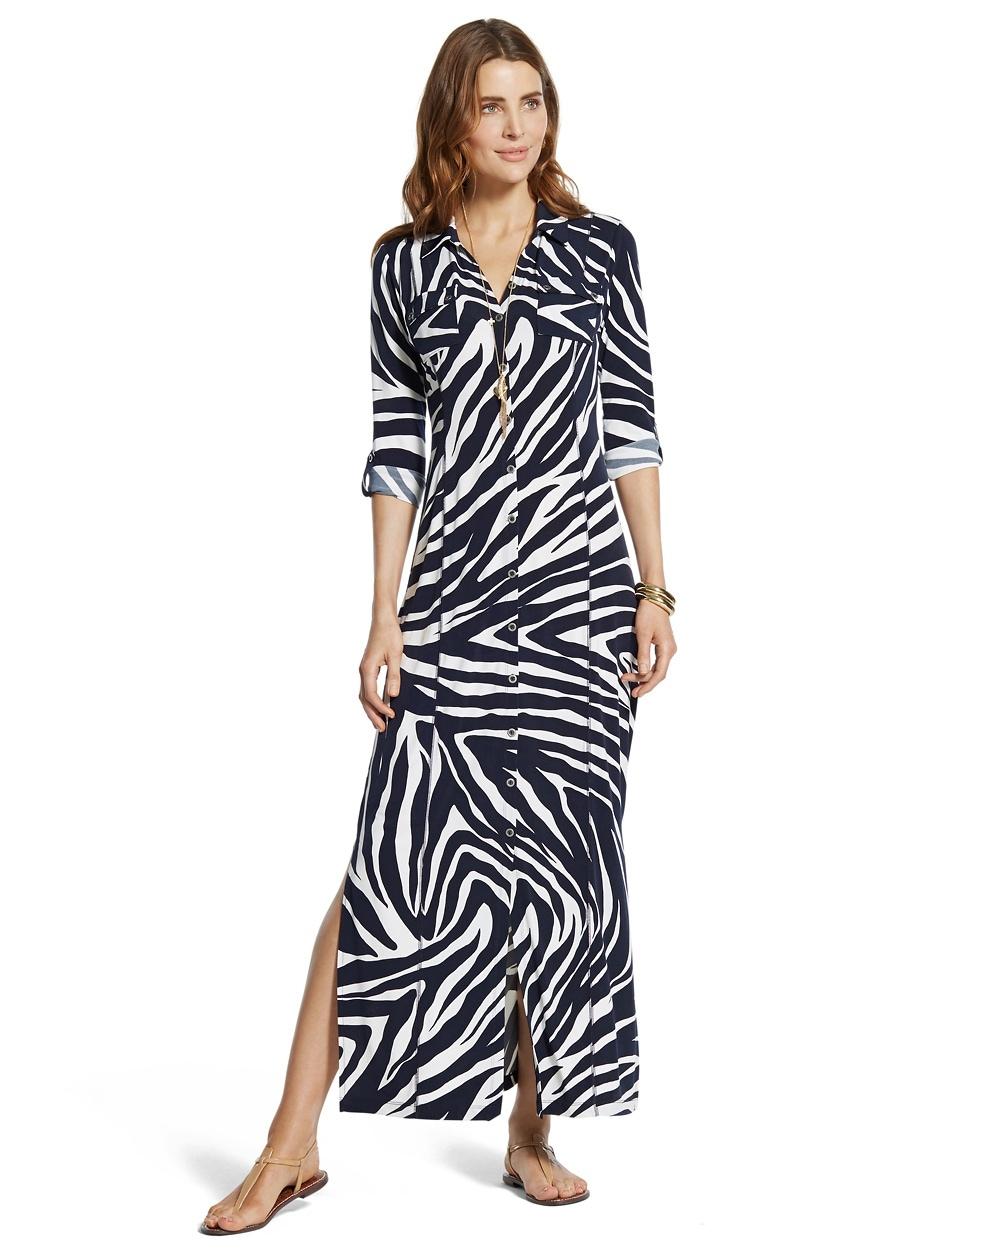 Return to thumbnail image selection Zebra-Print Maxi Dress video preview  image d55add416